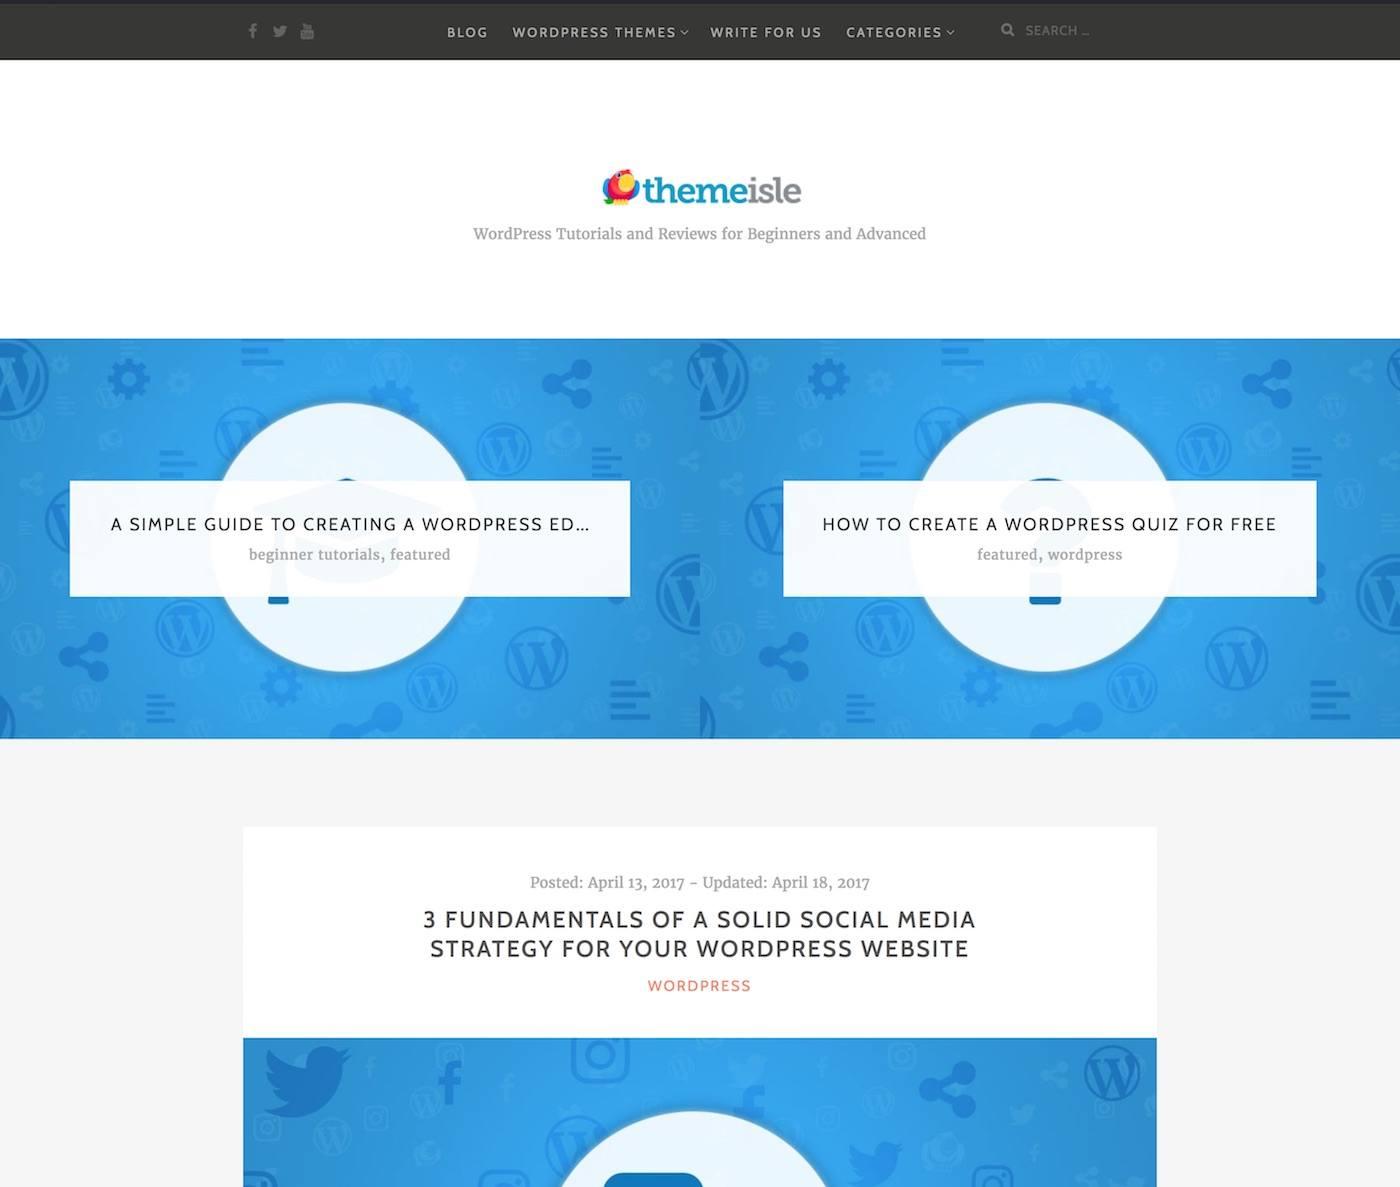 ThemeIsle blog